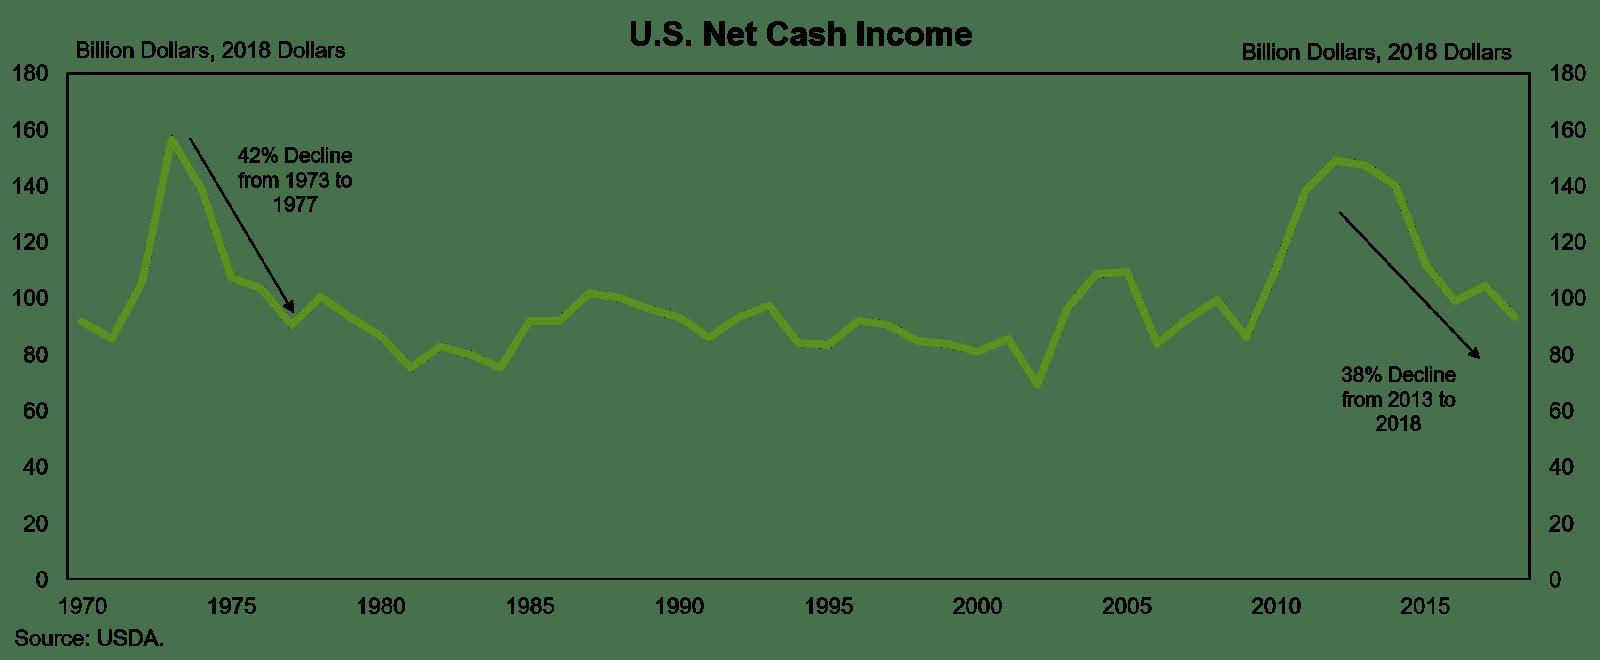 U.S. Net Cash Income graft